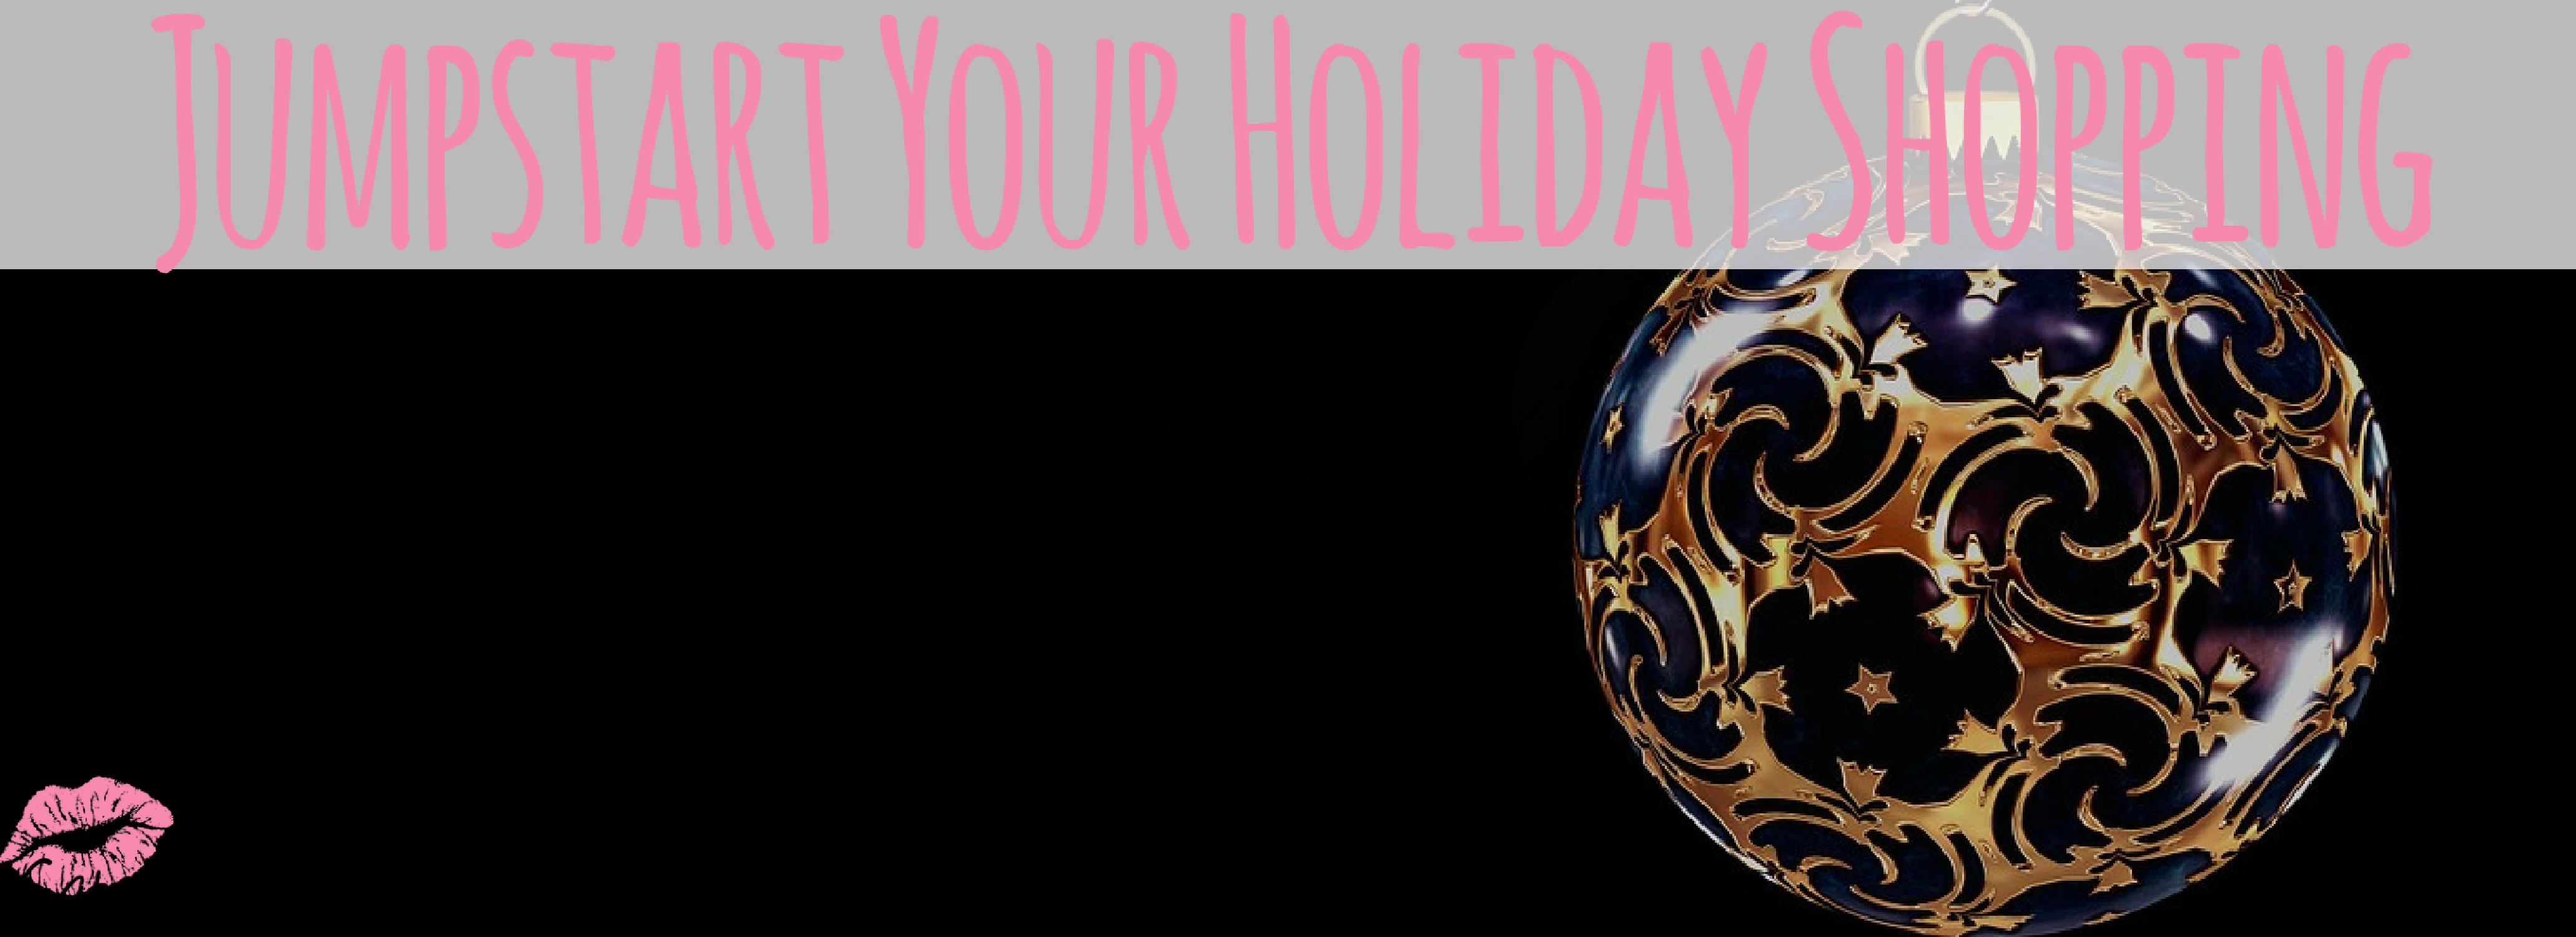 Jumpstart Your Holiday Shopping